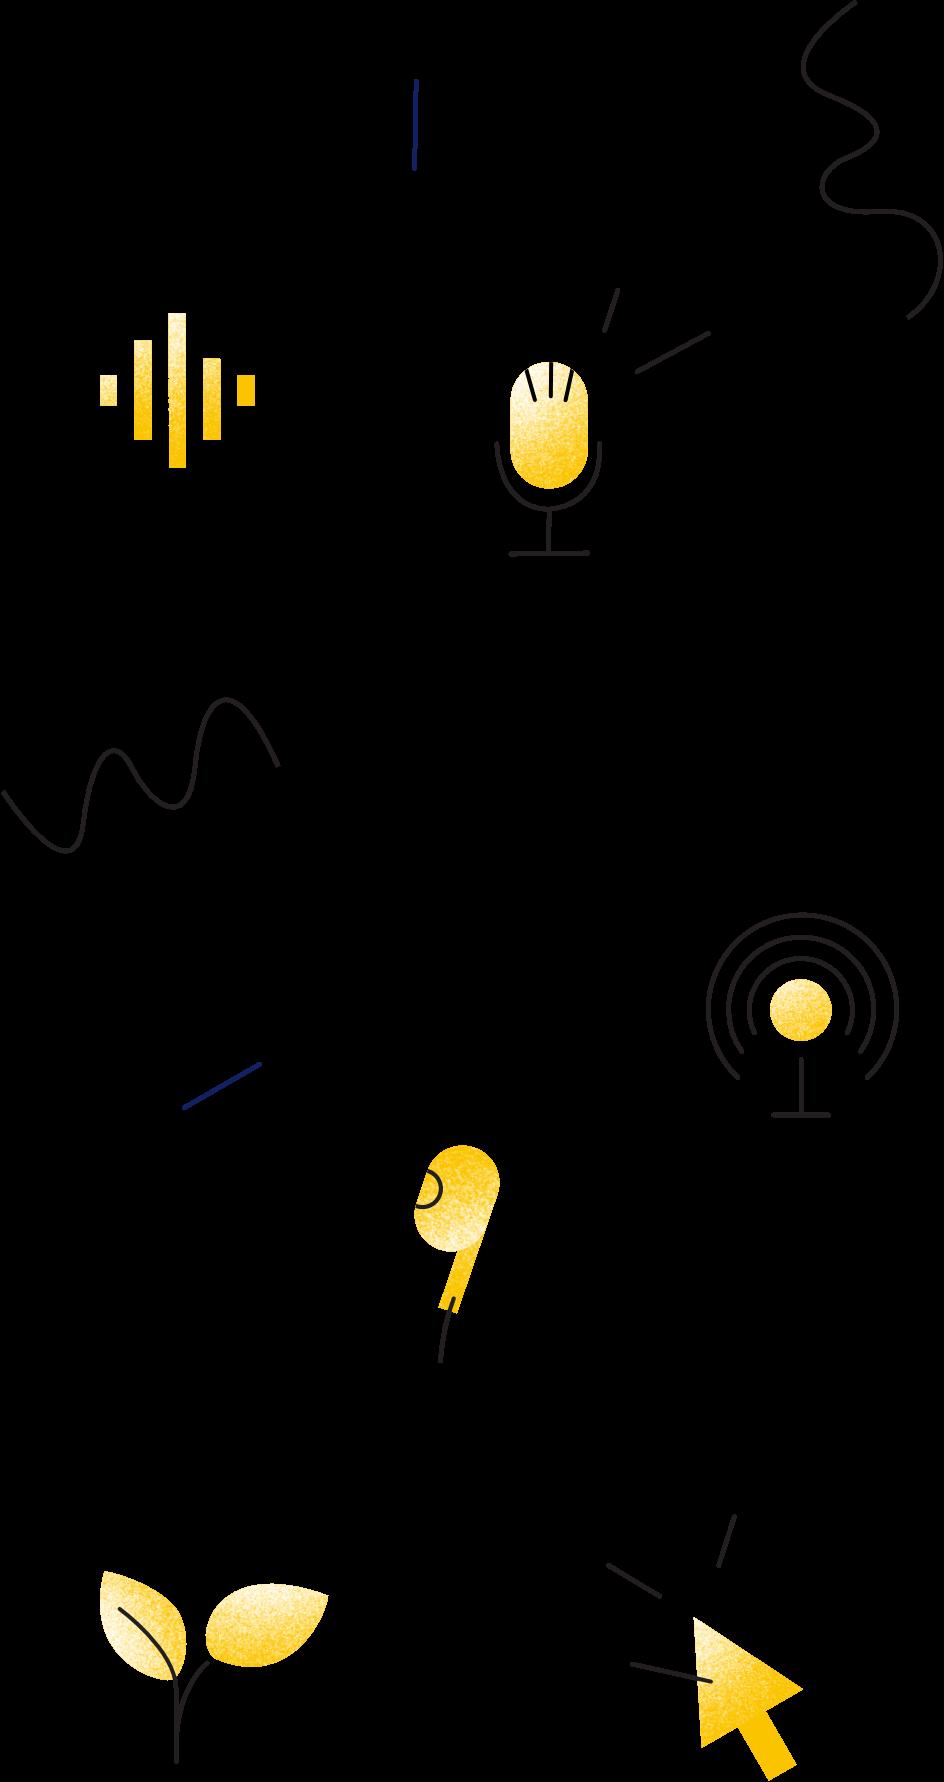 pen icon, mobile icon, earphones icon, heart icon